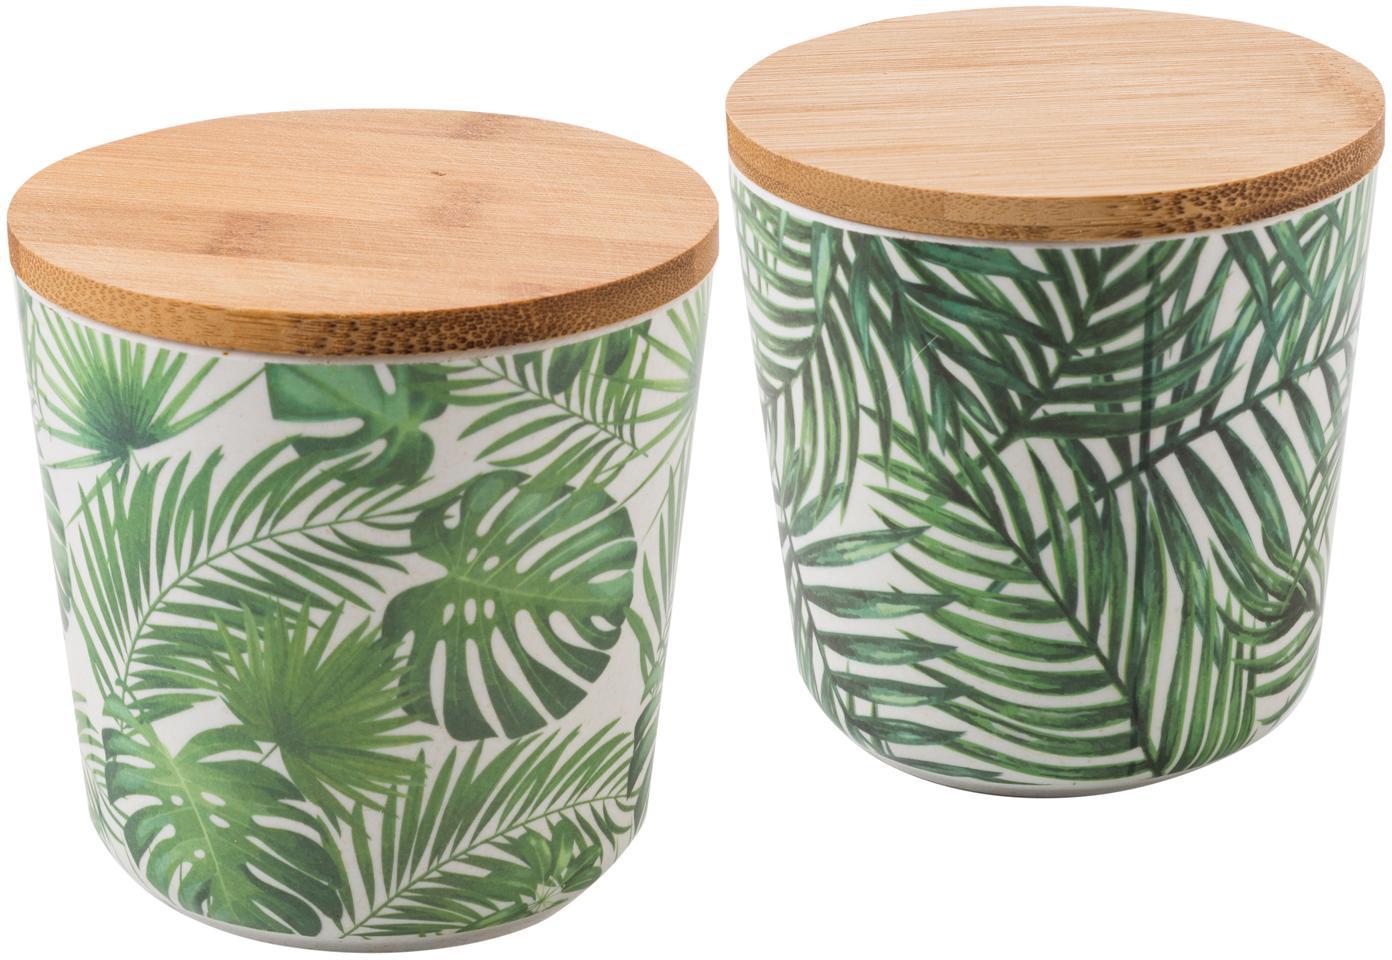 Aufbewahrungsdosen-Set Tropical, 2-tlg., Deckel: Bambusholz, Kunststoff, Grüntöne, Weiss, Ø 11 x H 11 cm